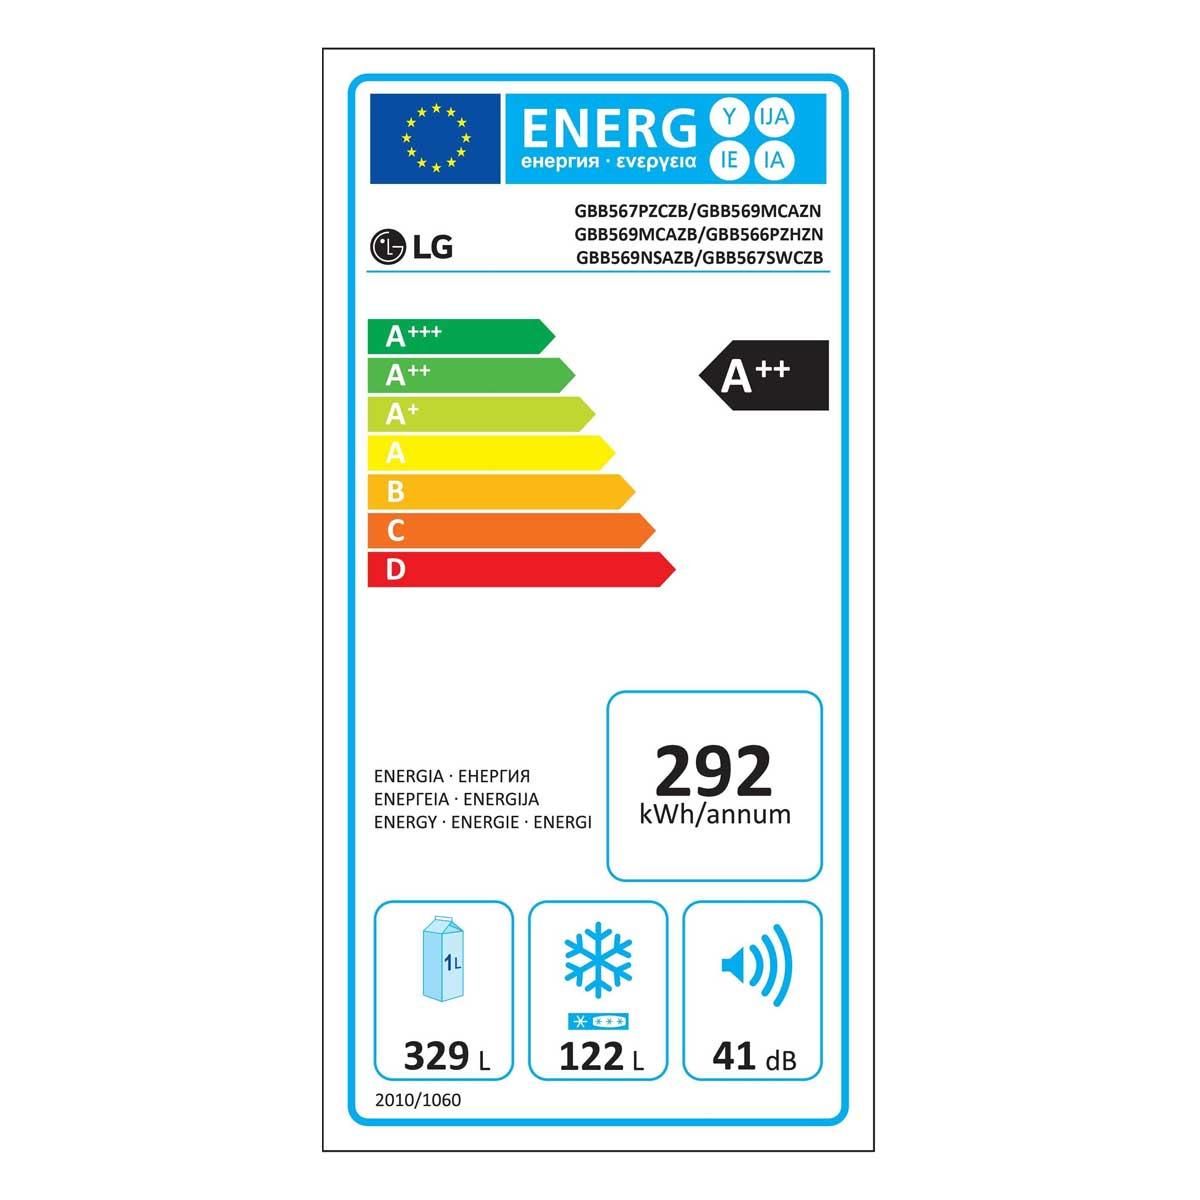 etichetta energetica LG GBB567PZCZB